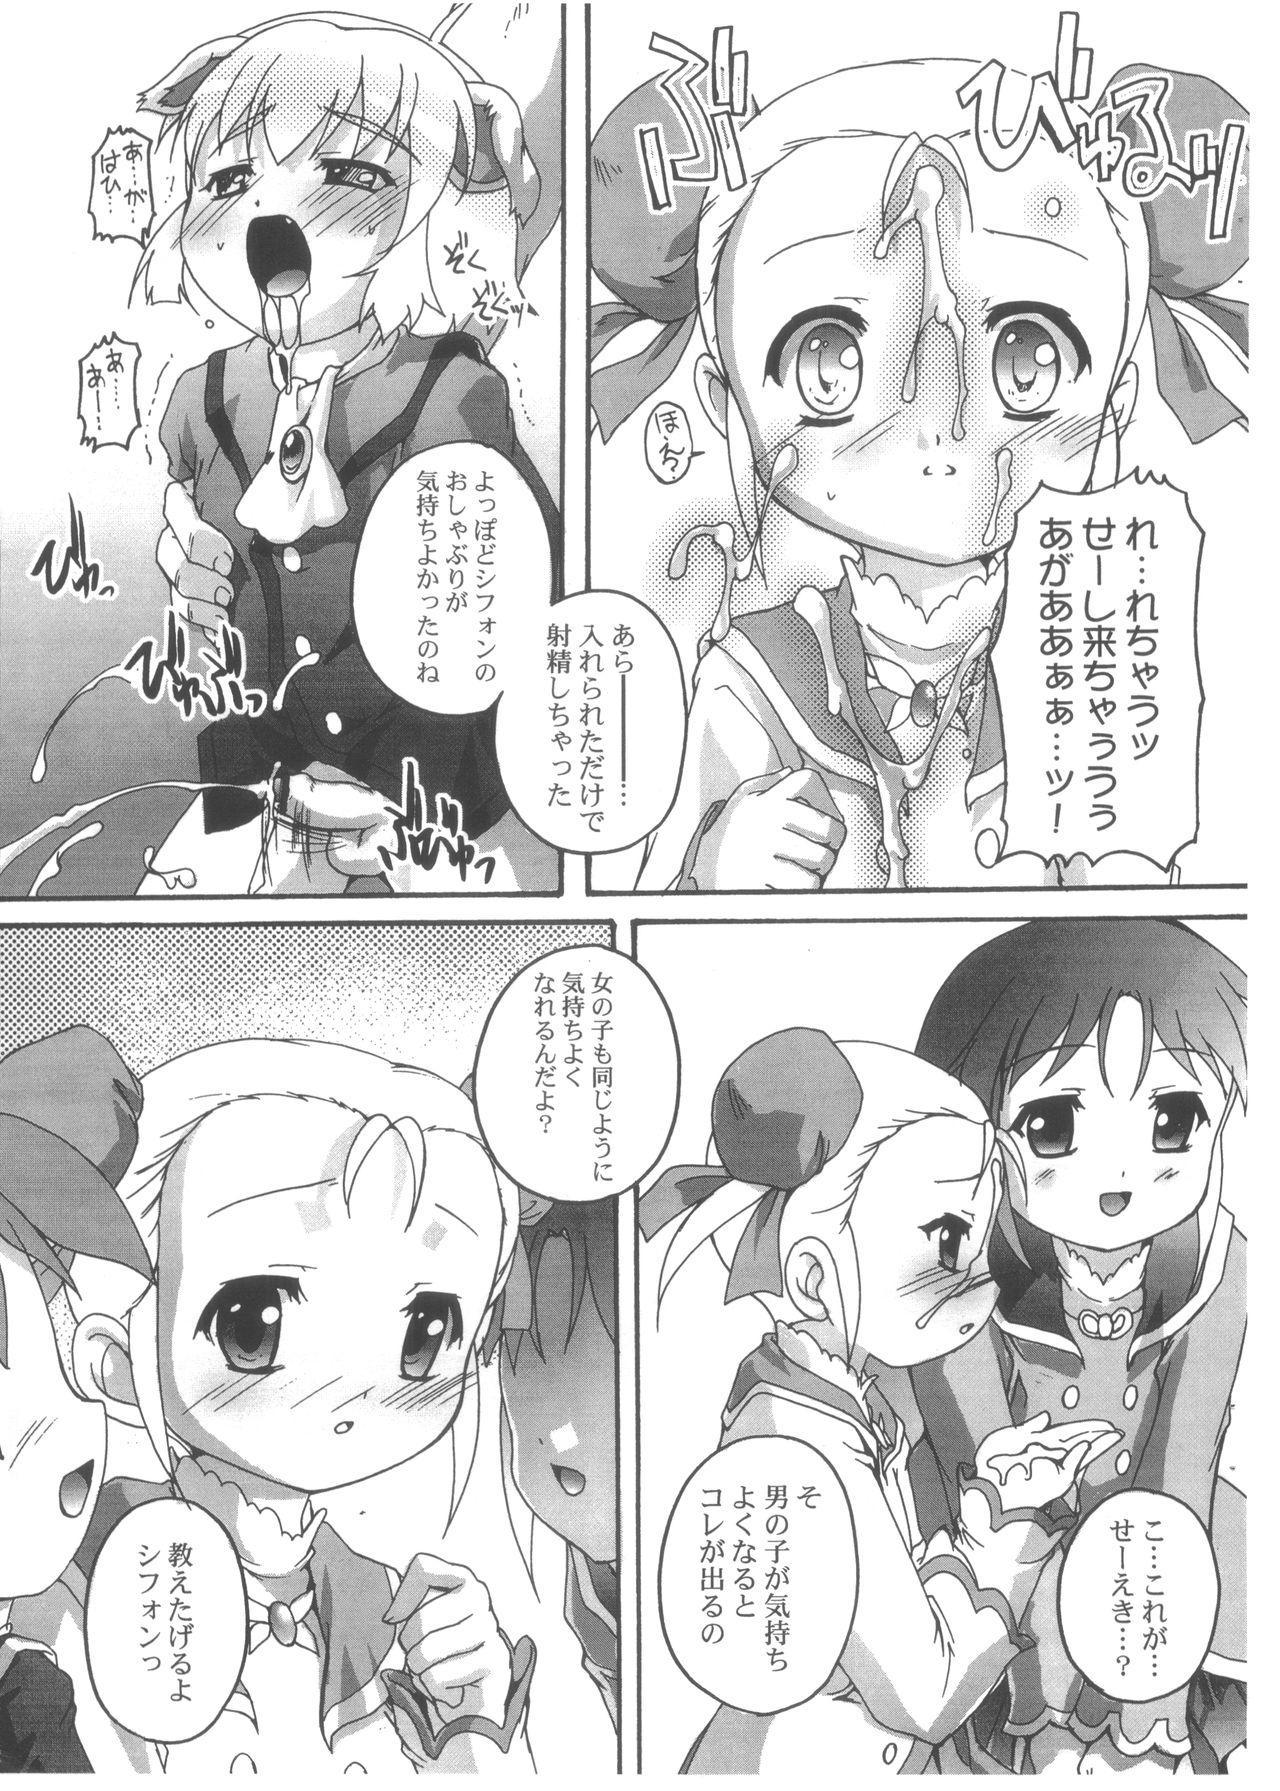 Fukanzen Nenshou 13 3